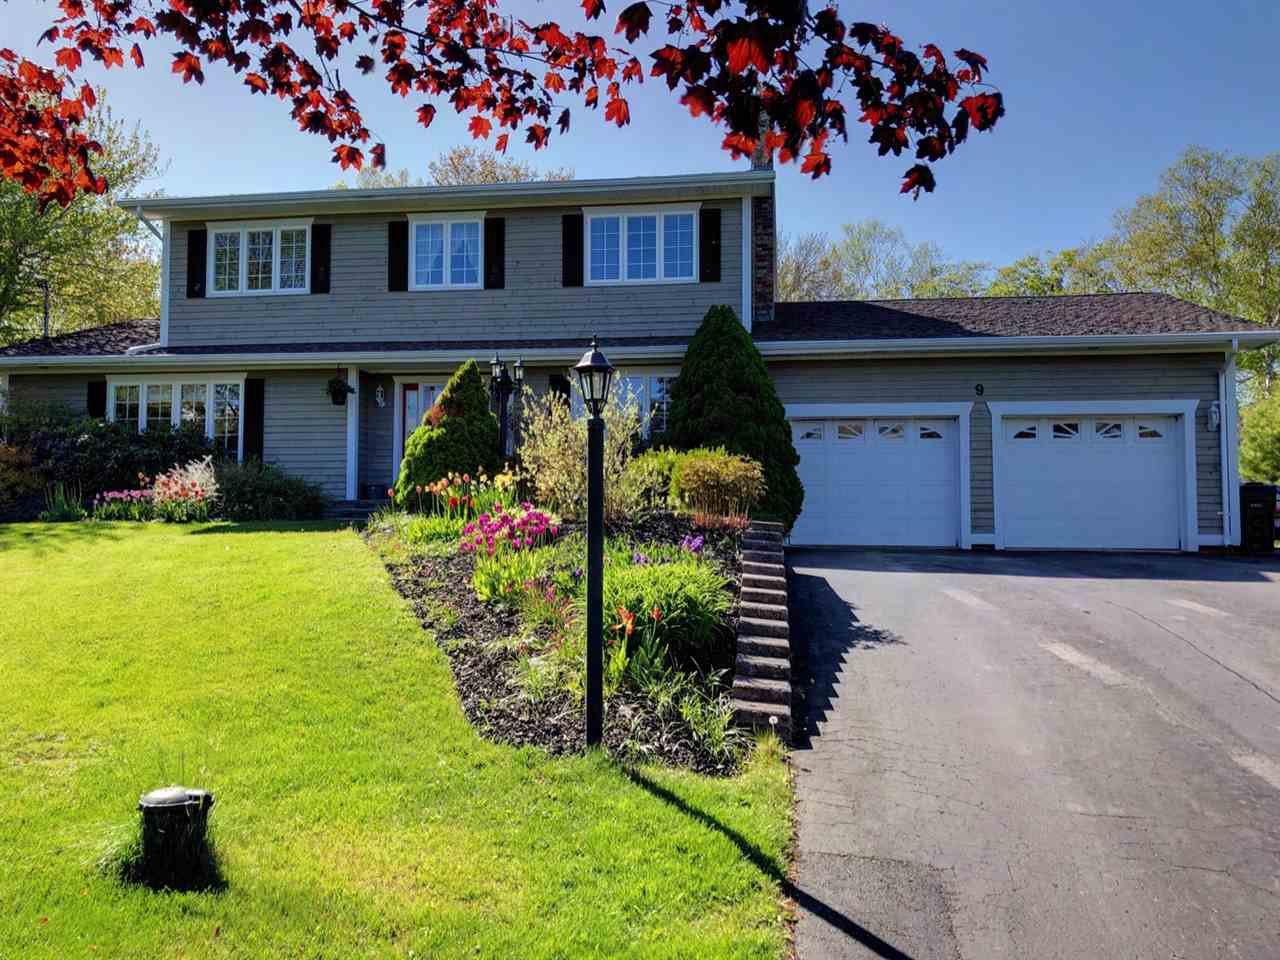 Main Photo: 9 Wyndale Crescent in Sydney River: 202-Sydney River / Coxheath Residential for sale (Cape Breton)  : MLS®# 202007749